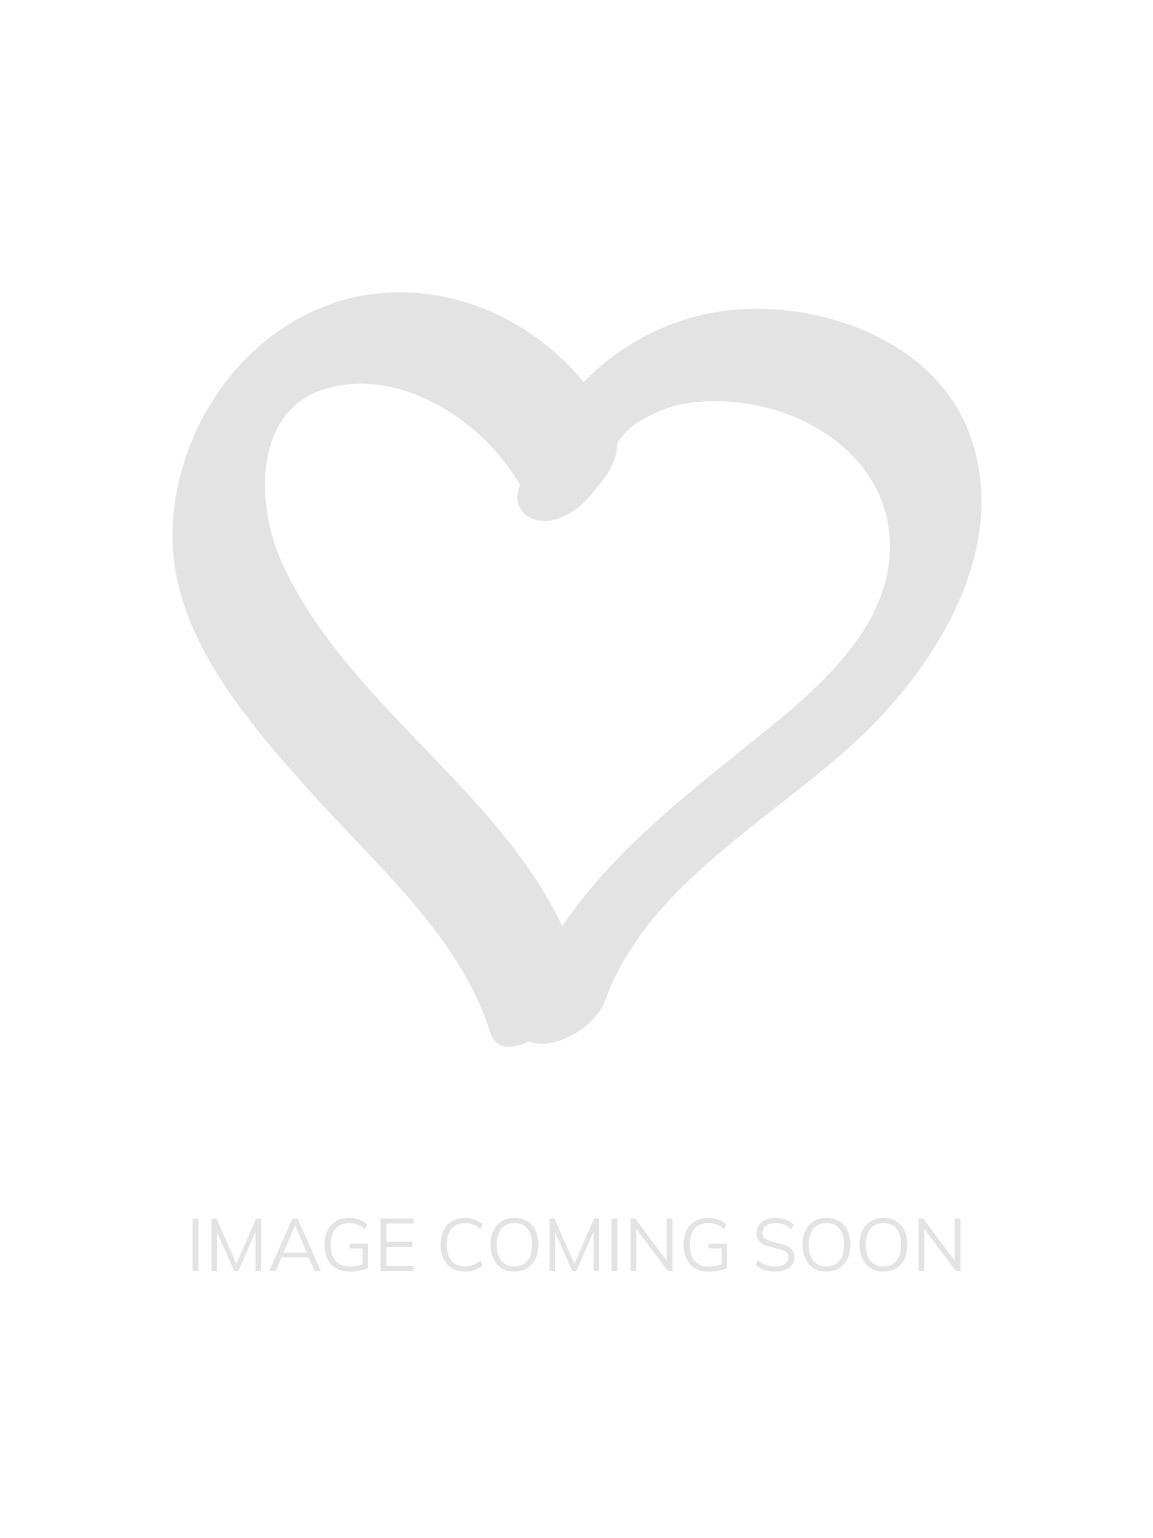 Rebecca Lace T Shirt Bra - Cherry  492e43cb3